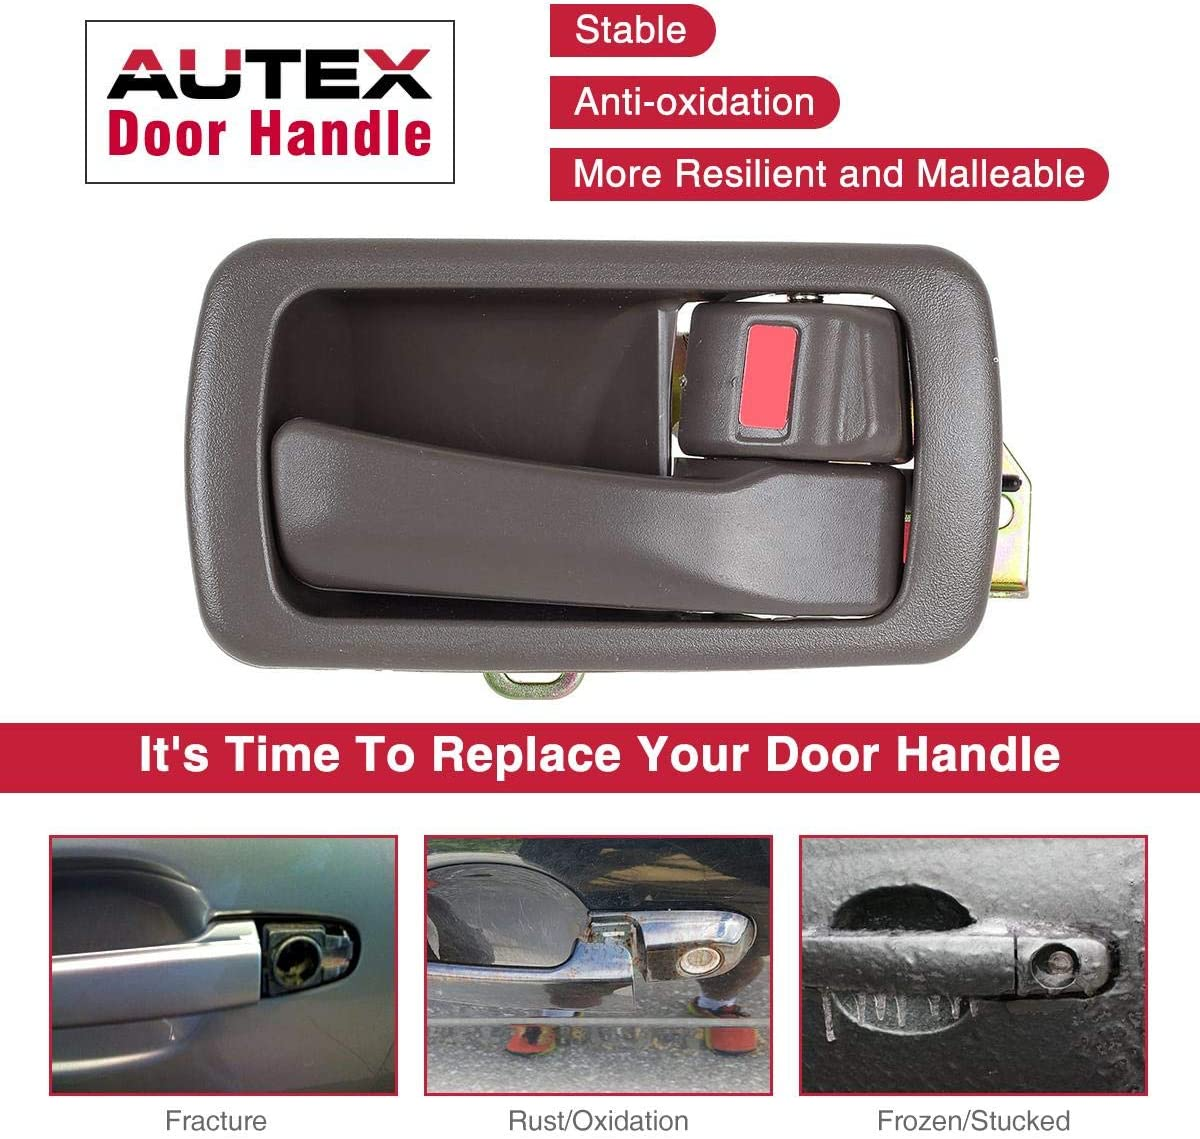 AUTEX Door Handles 4pcs Interior Front Rear Left Driver Right Passenger Side Compatible with Toyota Camry 1992 1993 1994 1995 1996 Door Handle 80486 80493